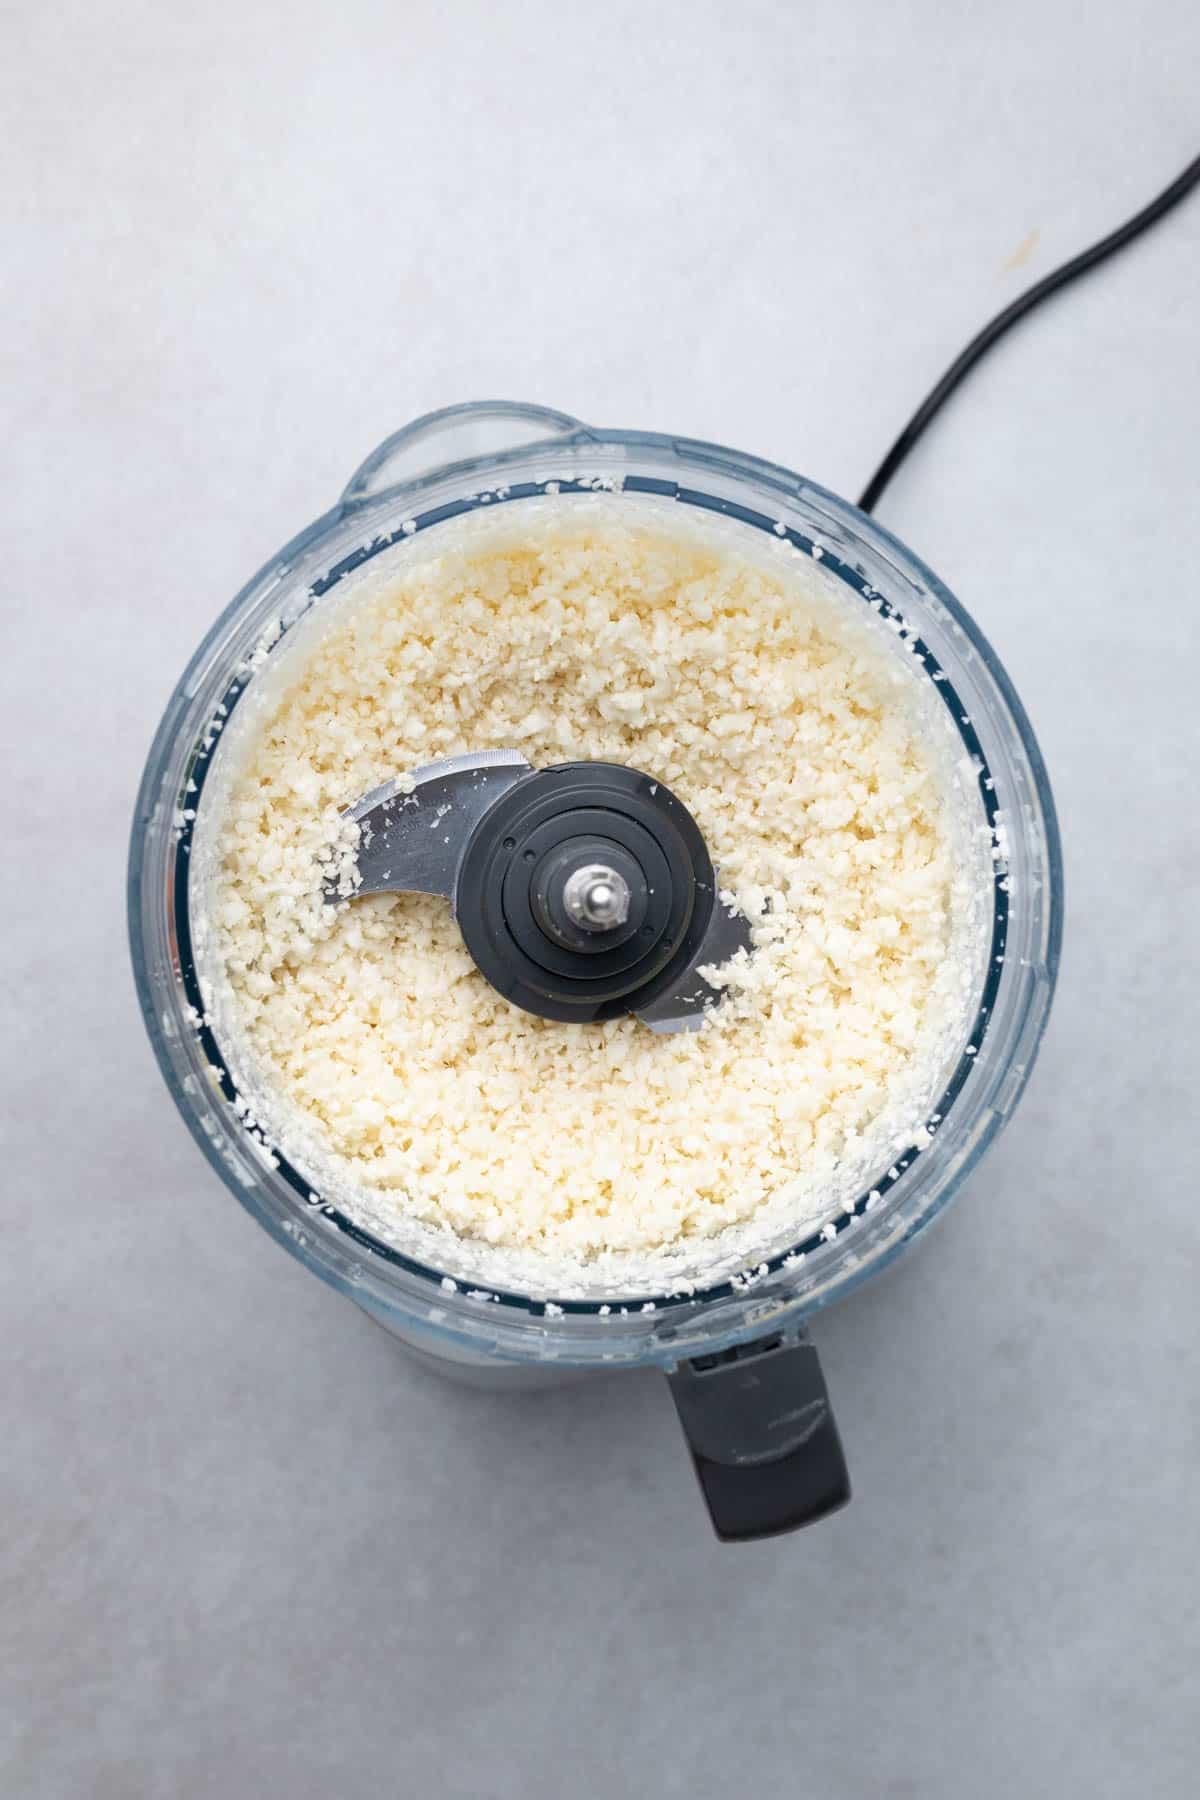 riced cauliflower in a food processor